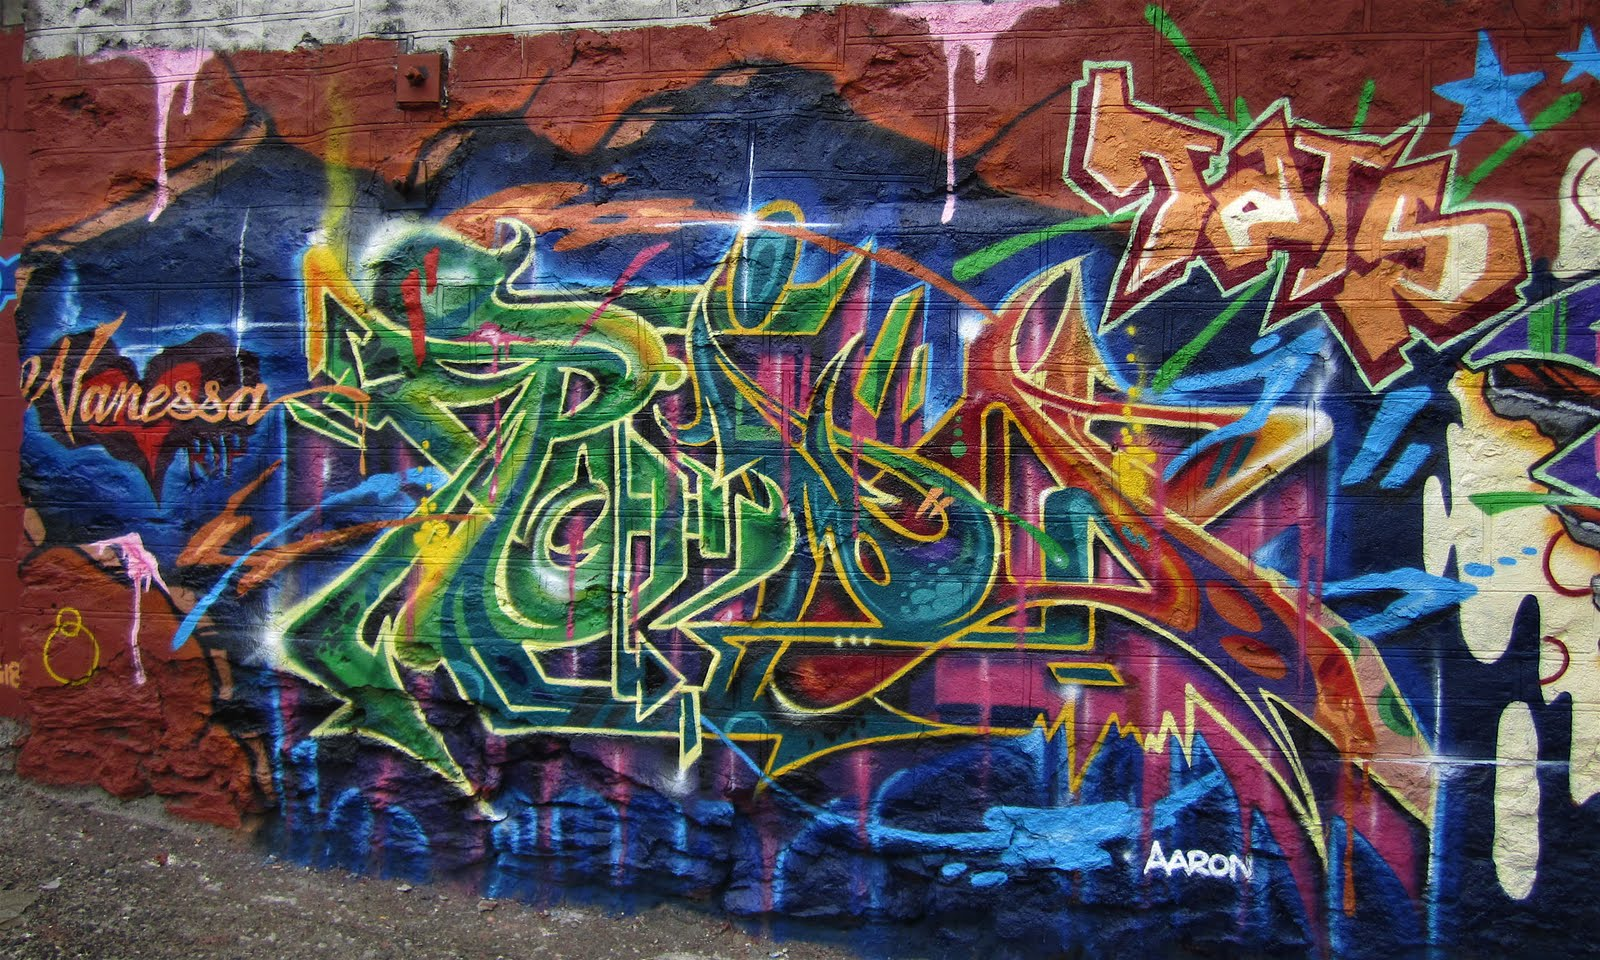 Tats cru may 2011 for Big pun mural bronx